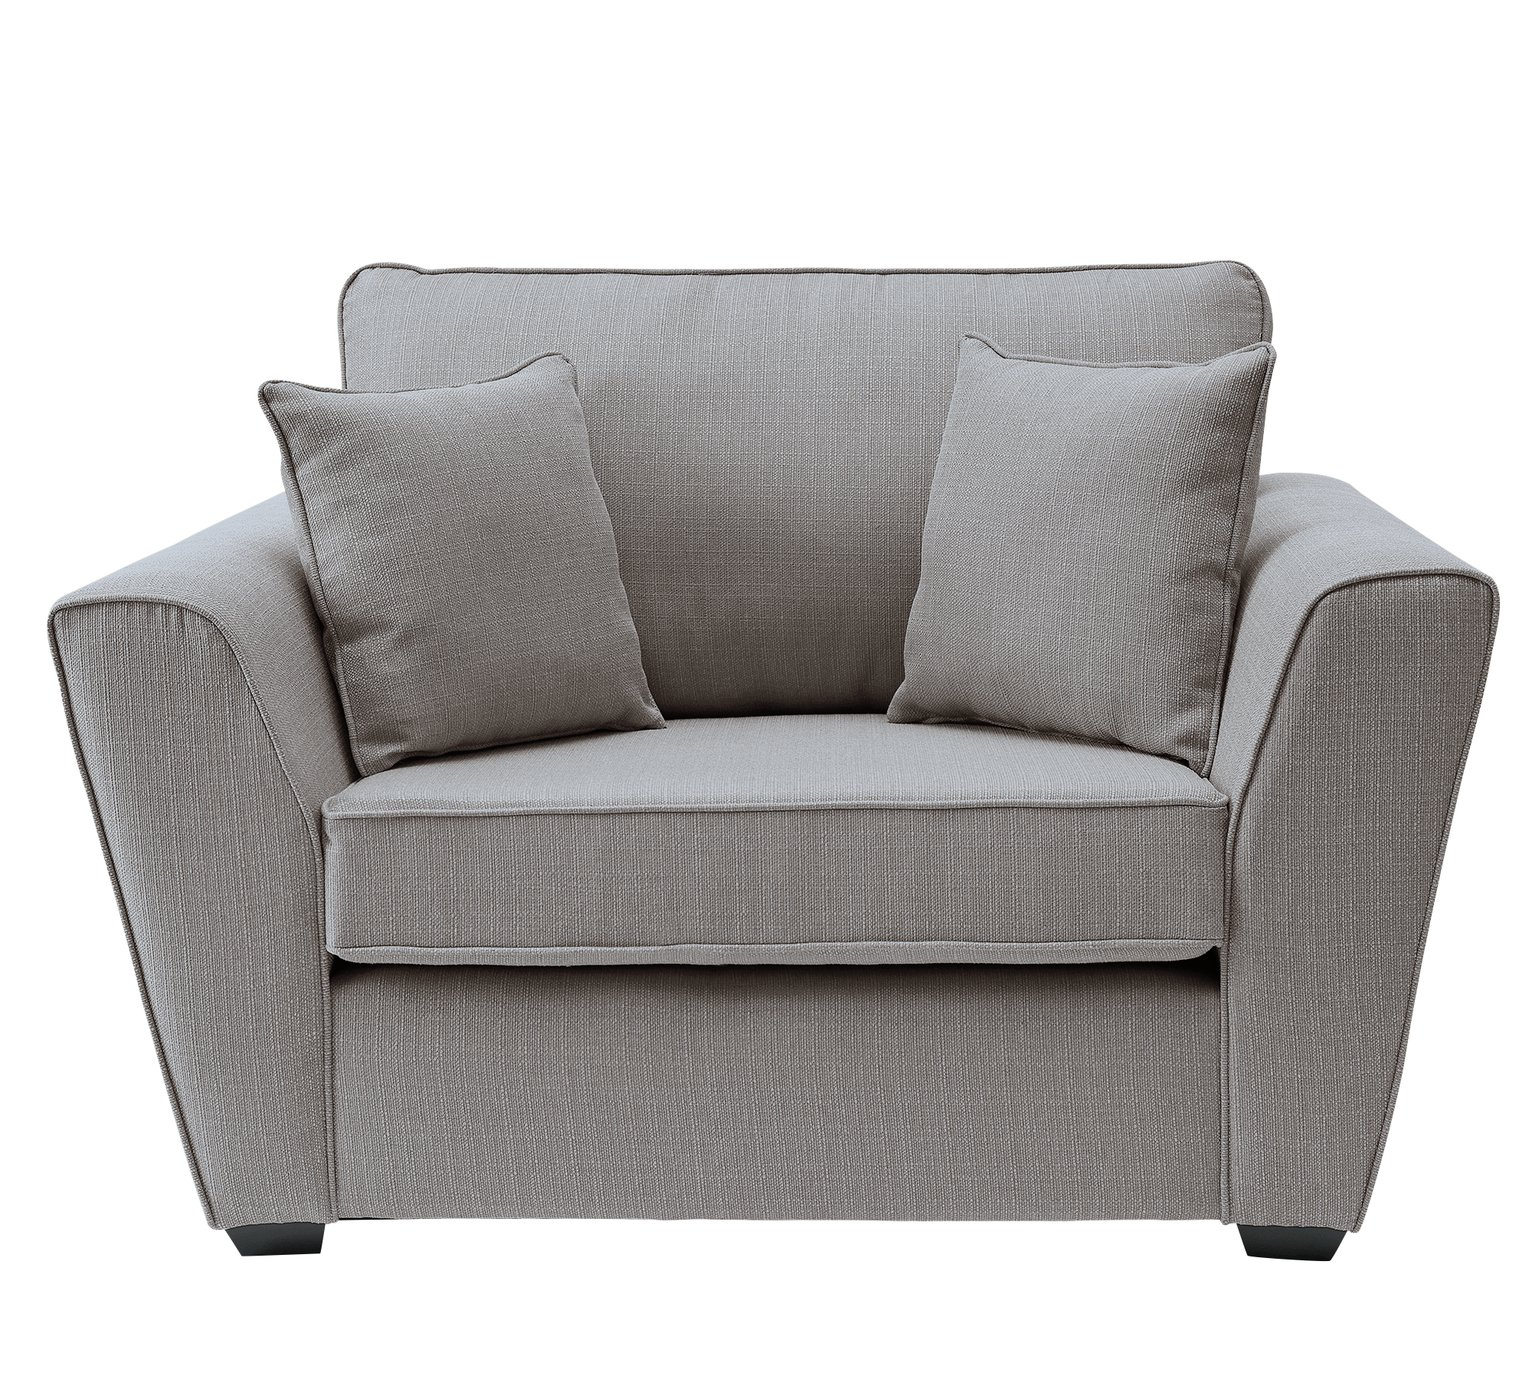 Argos Home Renley Fabric Cuddle Chair - Light Grey